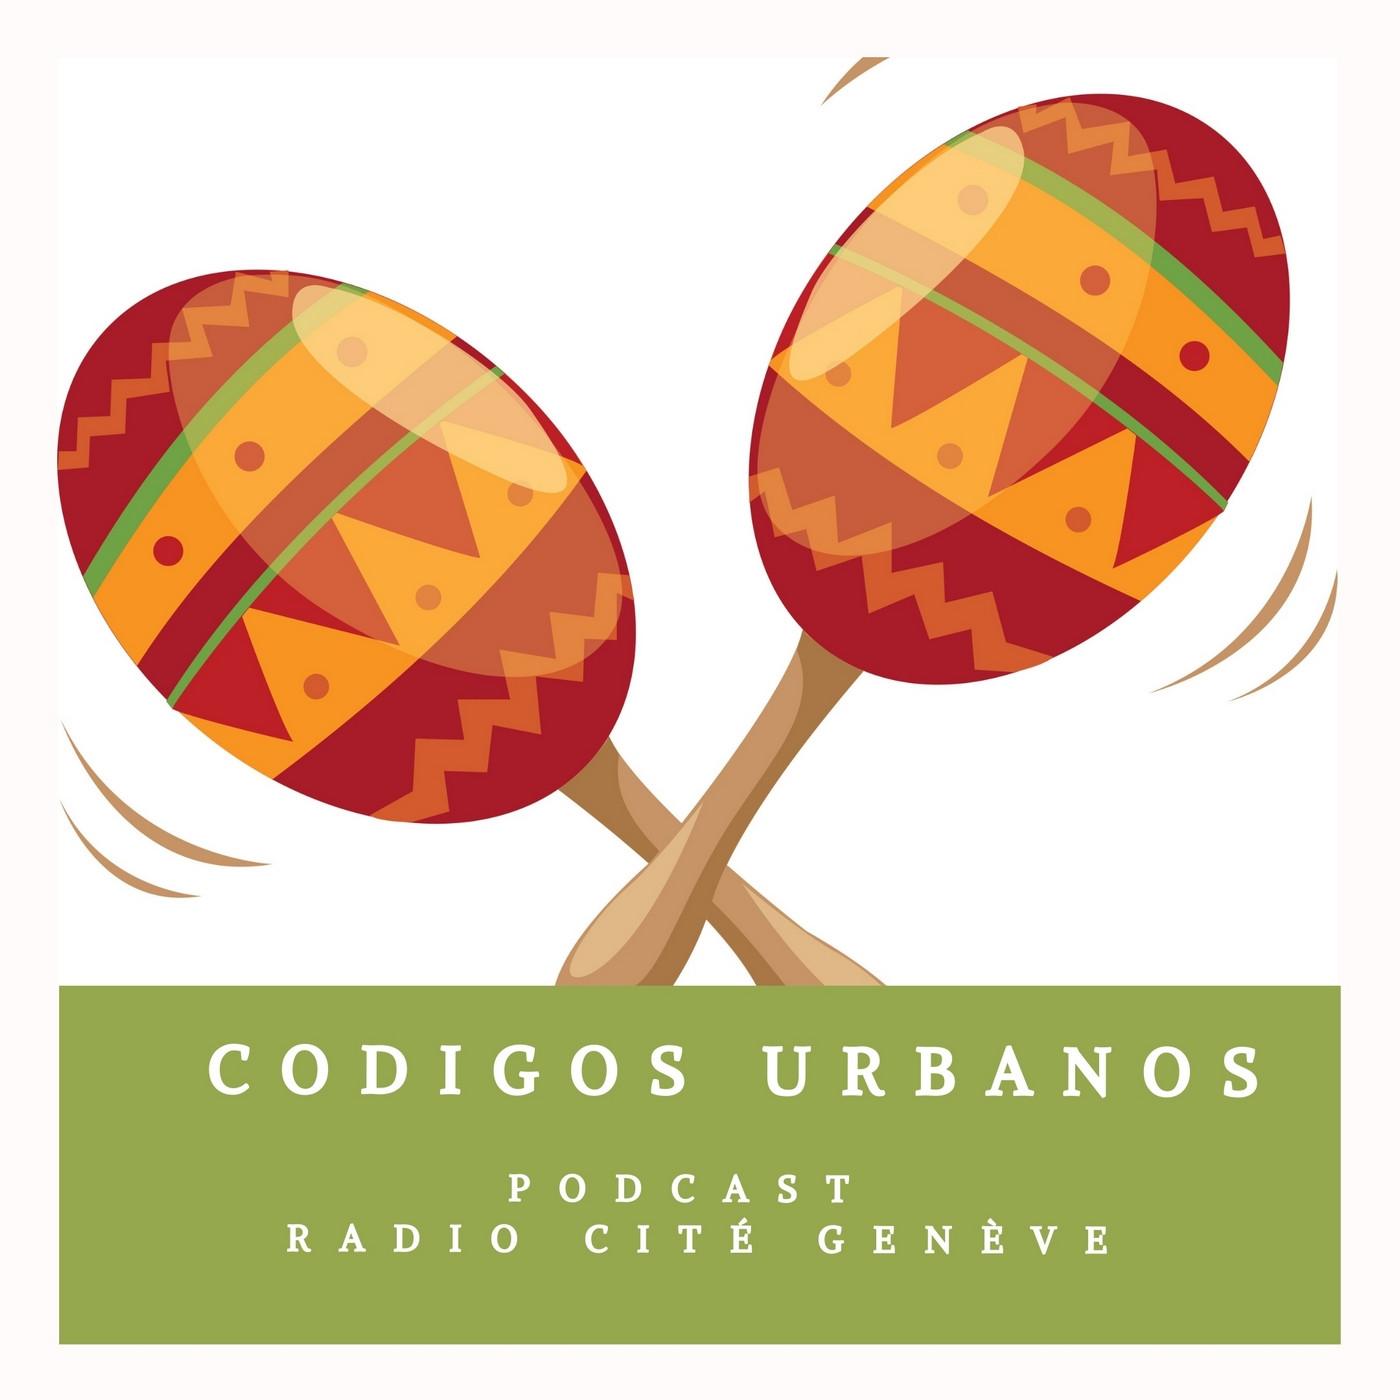 Codigos Urbanos - 02/02/21